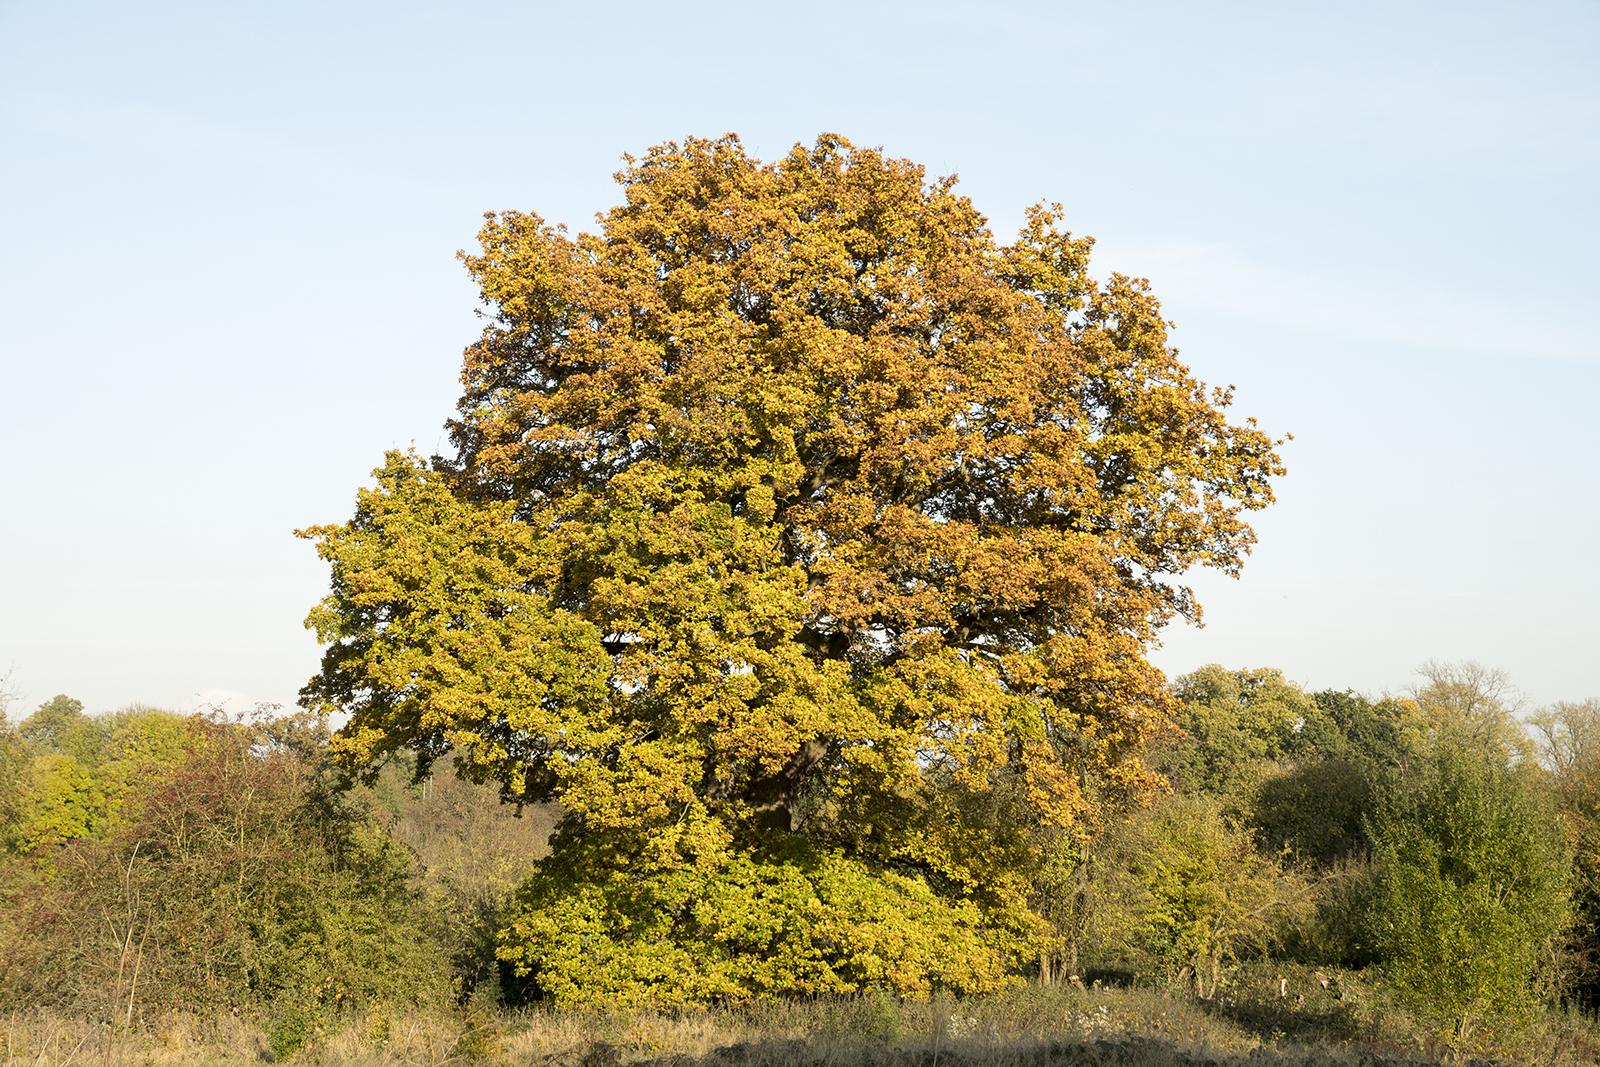 20161111_Bromley_Scadbury-Park-Nature-Reserve_Flora_Winter_Autumn-leaves